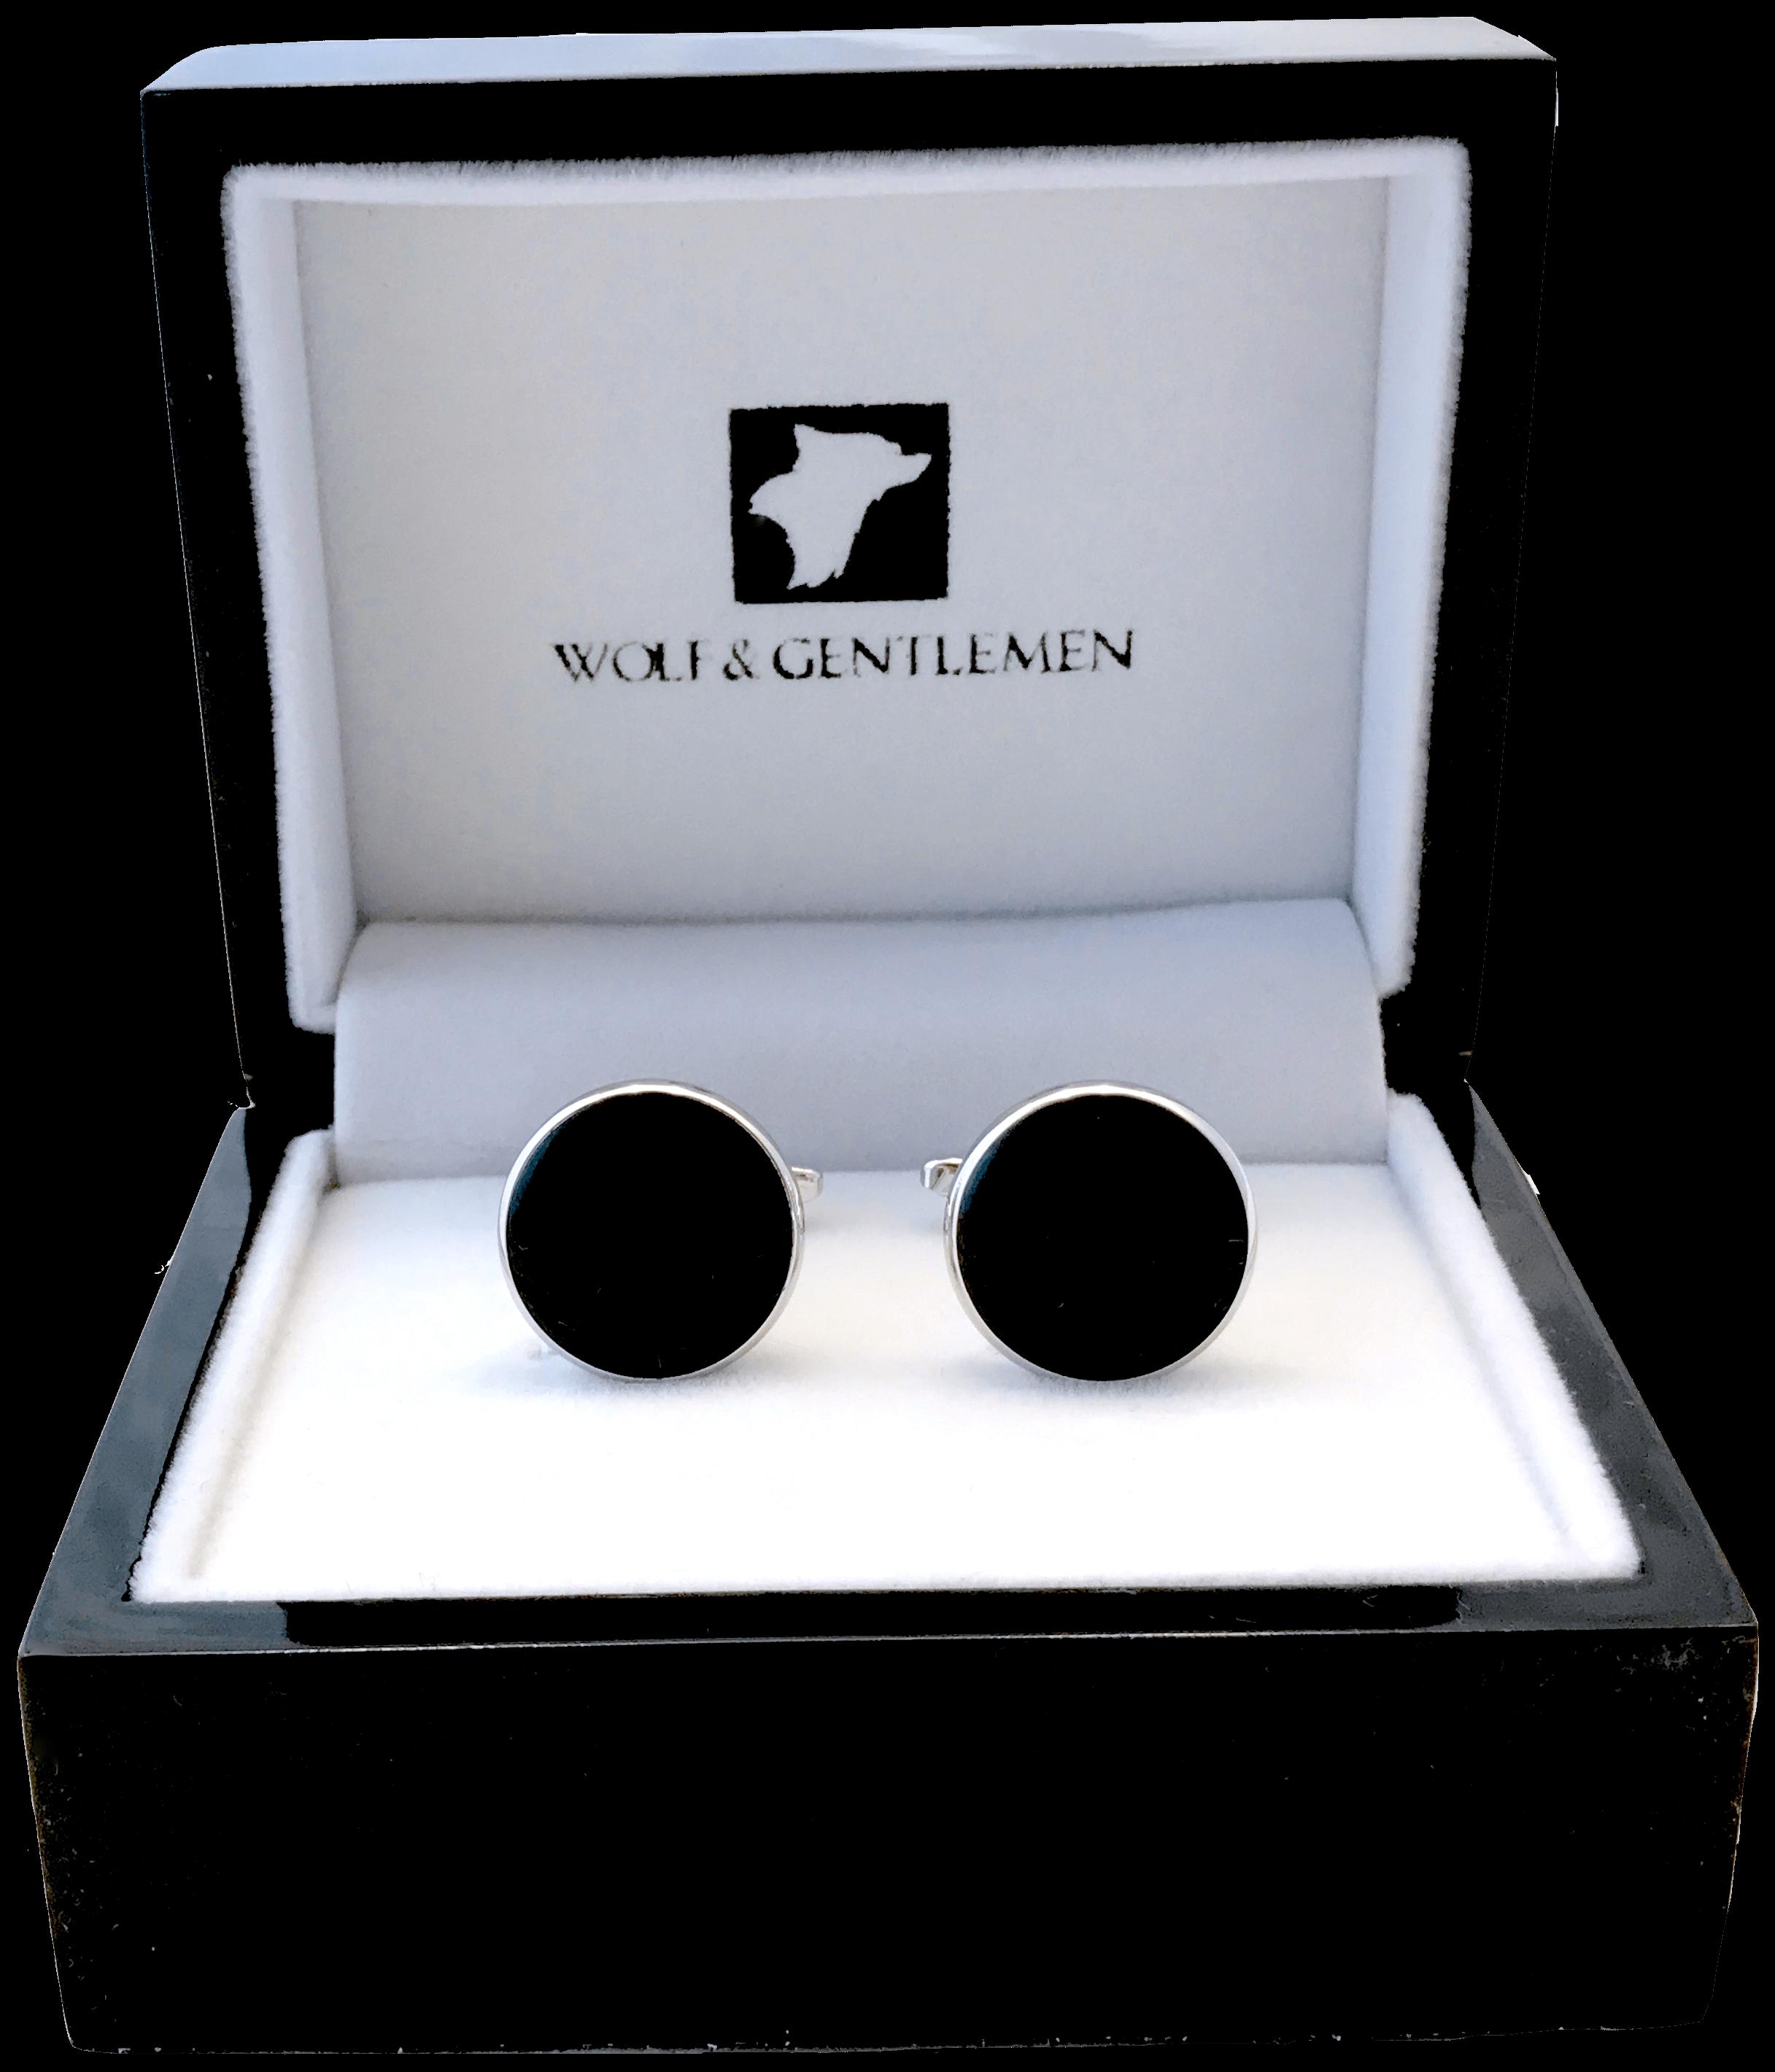 wolfandgentlemen-modell-classic-black-in-box